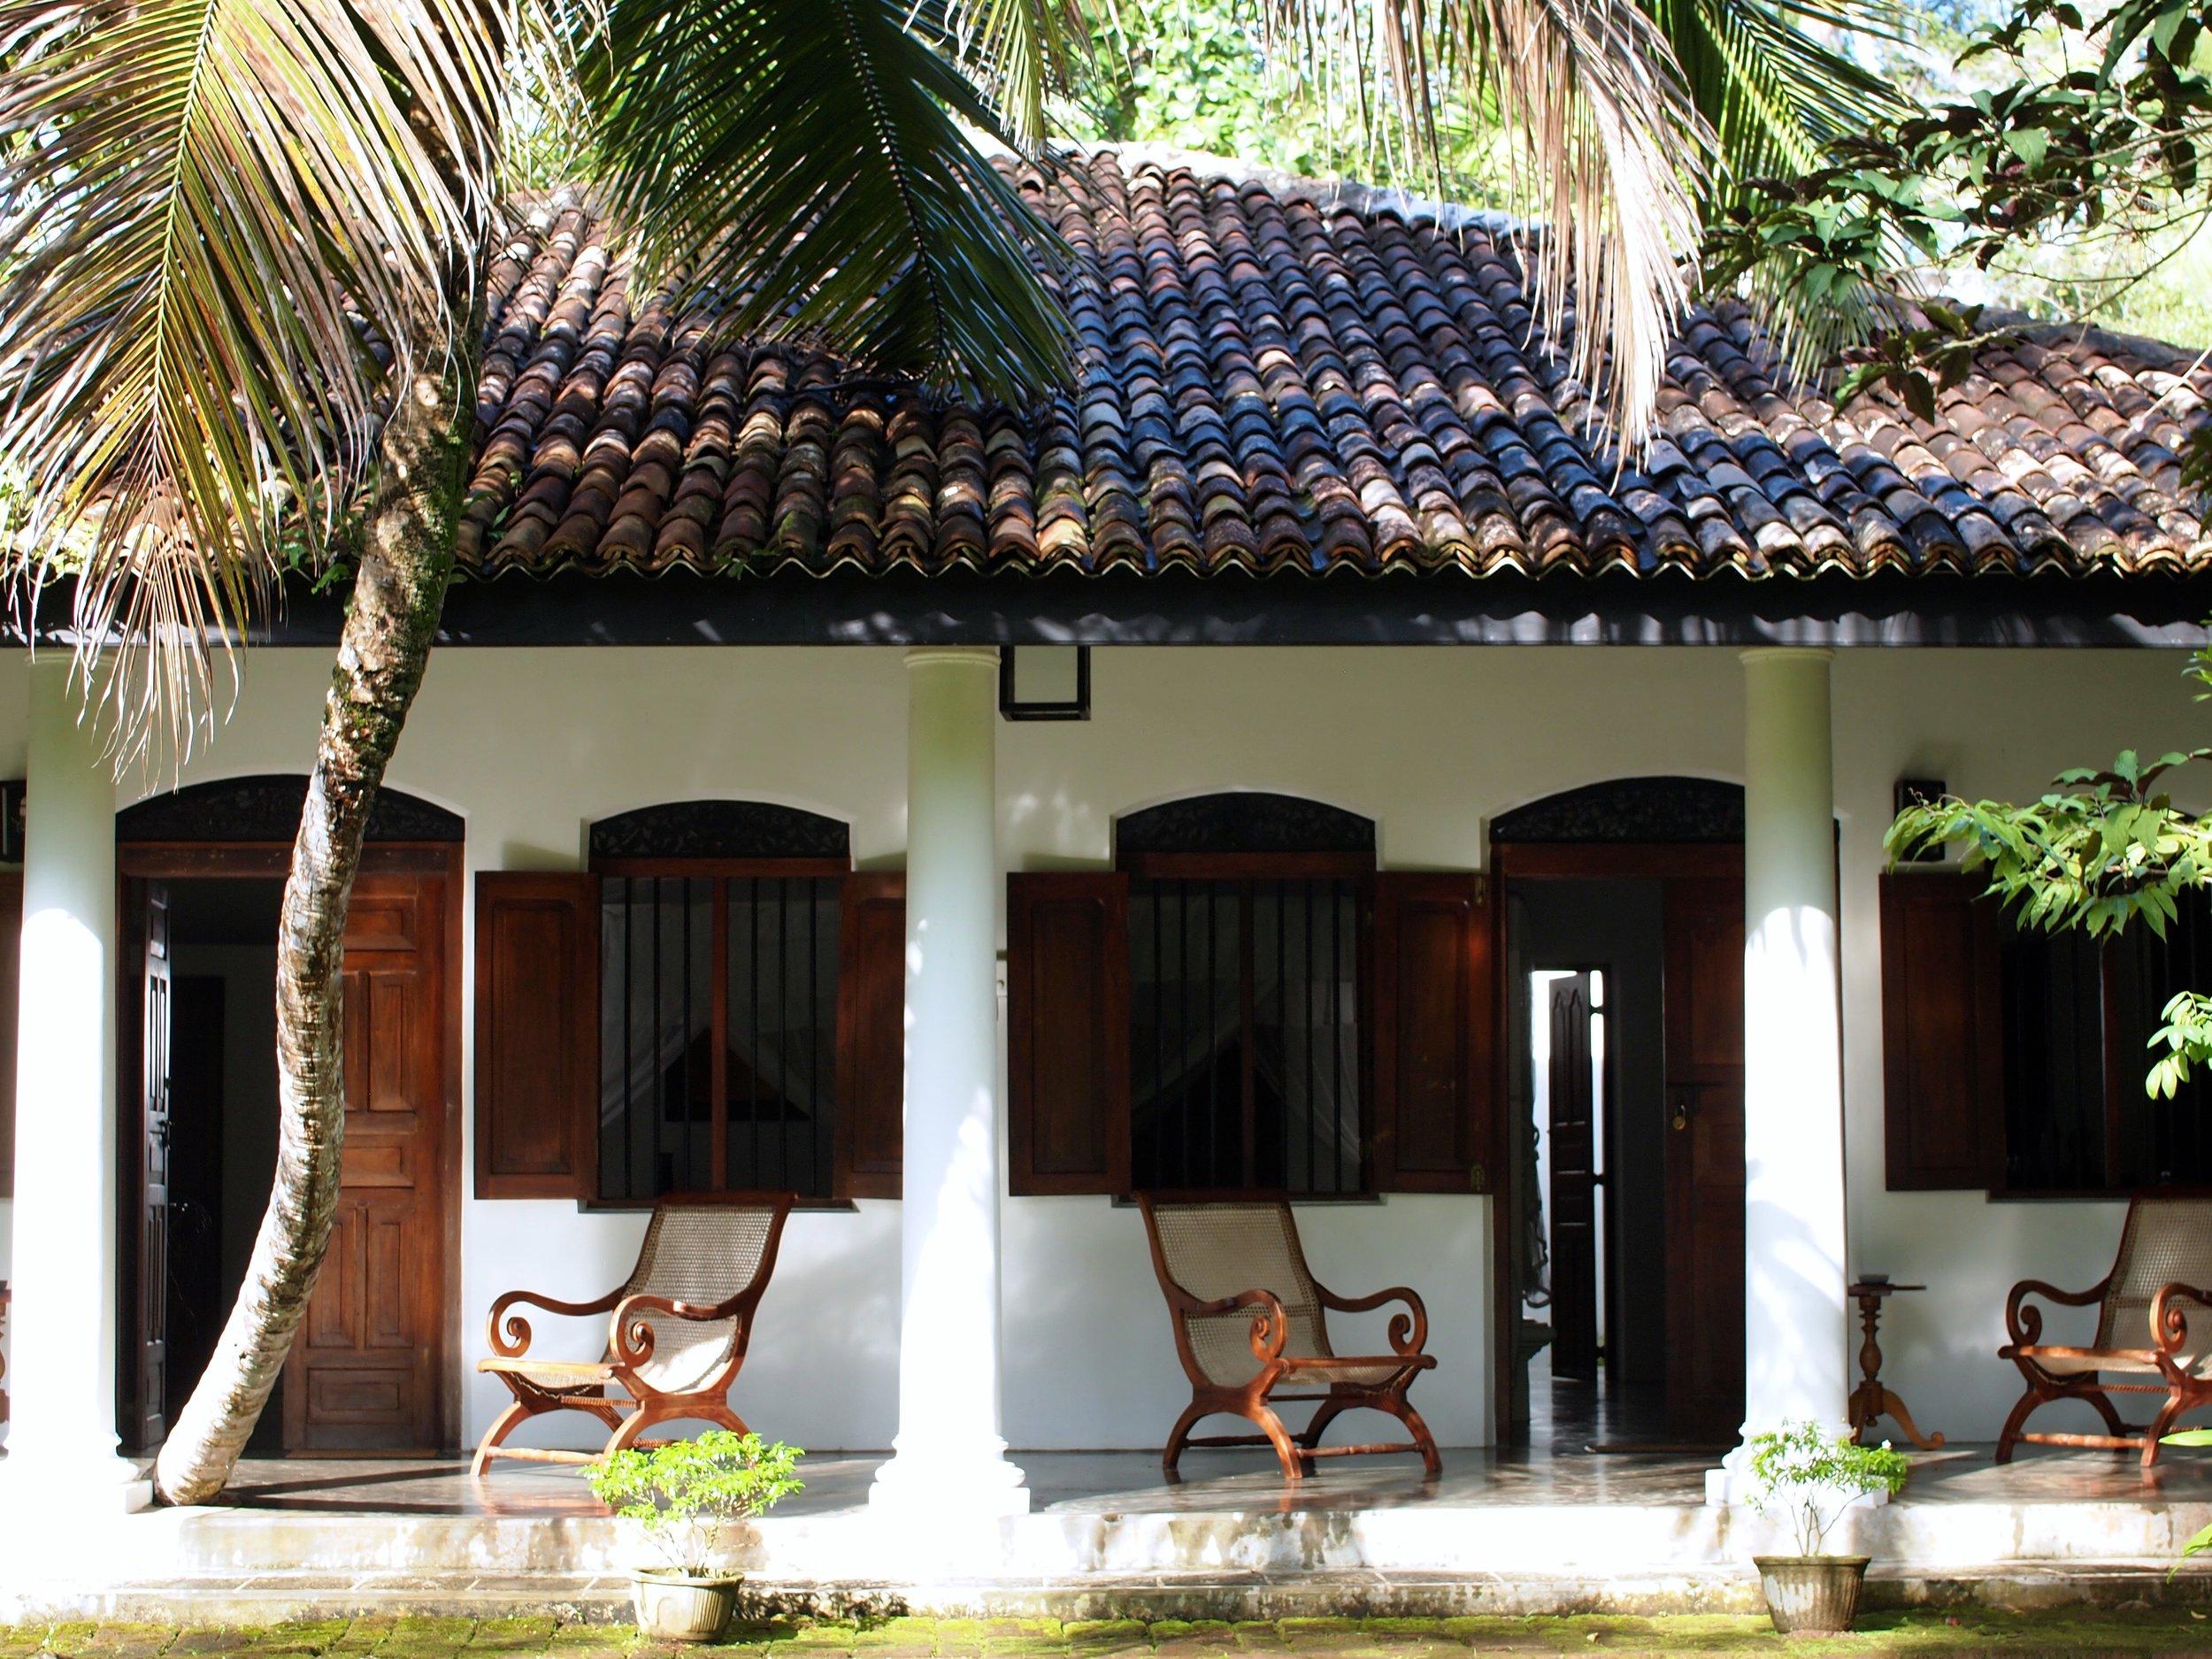 Nisala Arana bungalow, Sri Lanka (image by Jacqui Gibson).